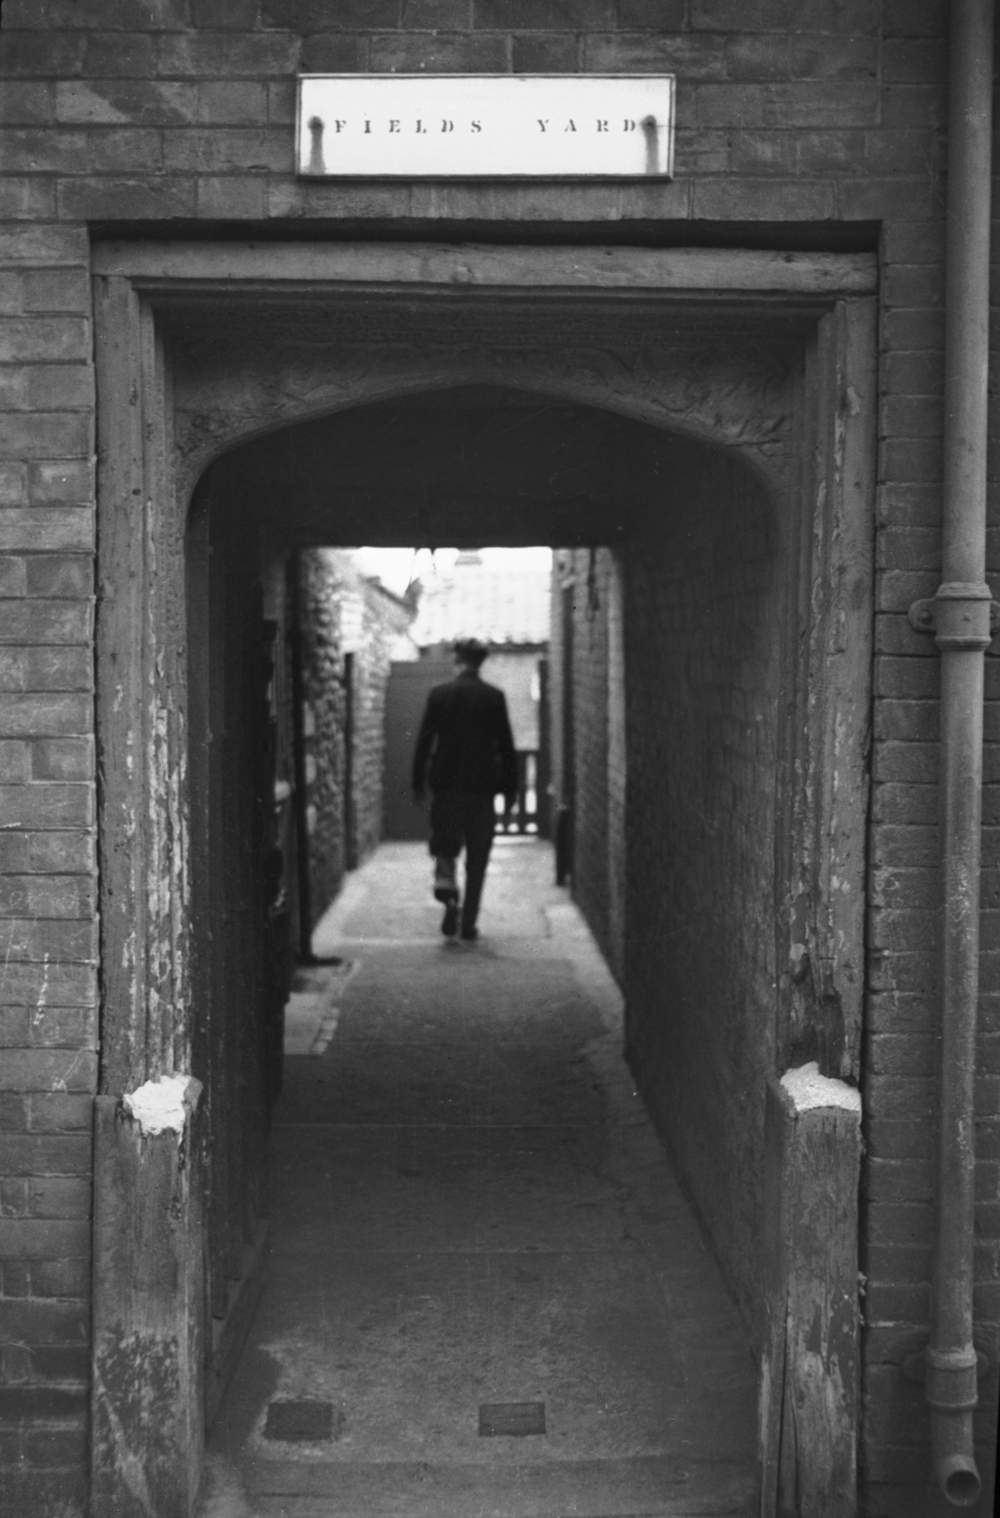 Field's Yard Tudor Archway 1935